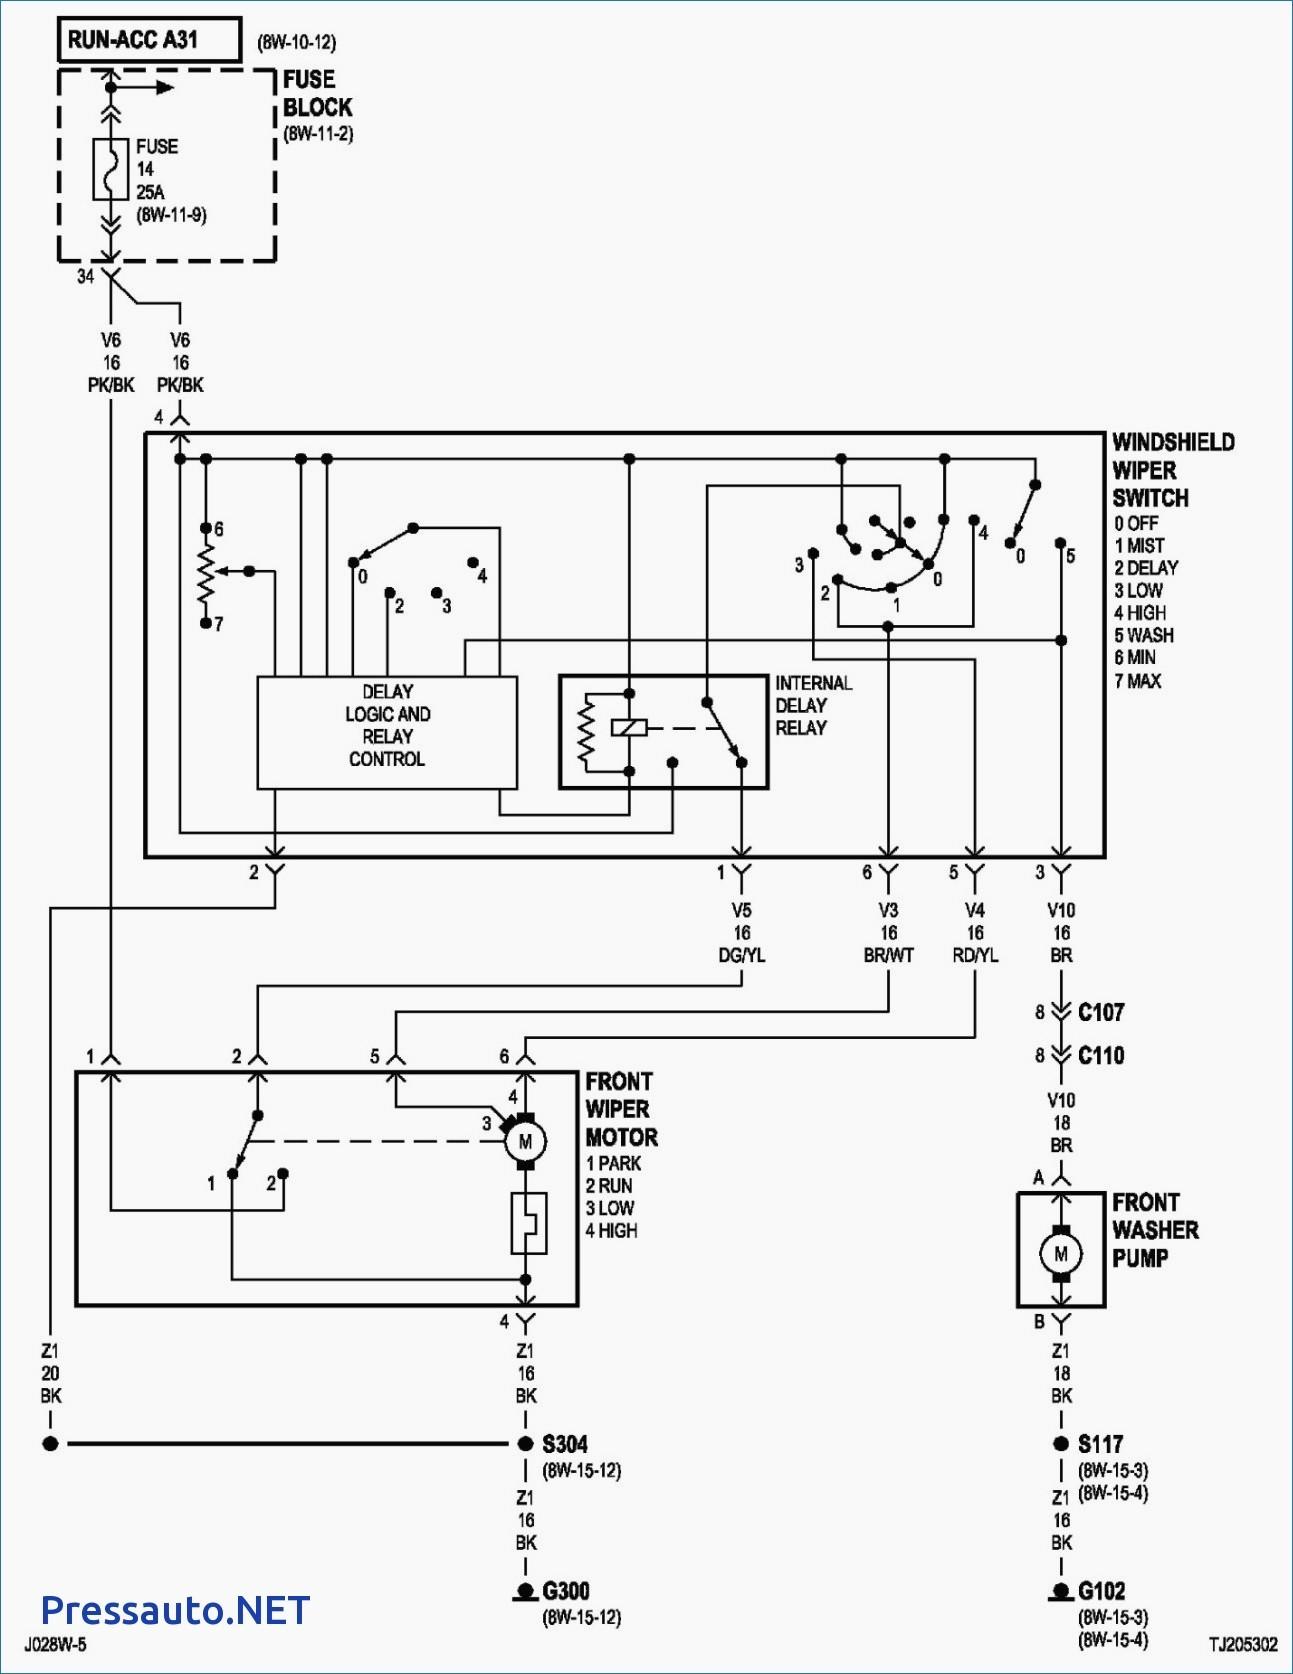 1989 Jeep Wrangler Radio Wiring Diagram Pictures